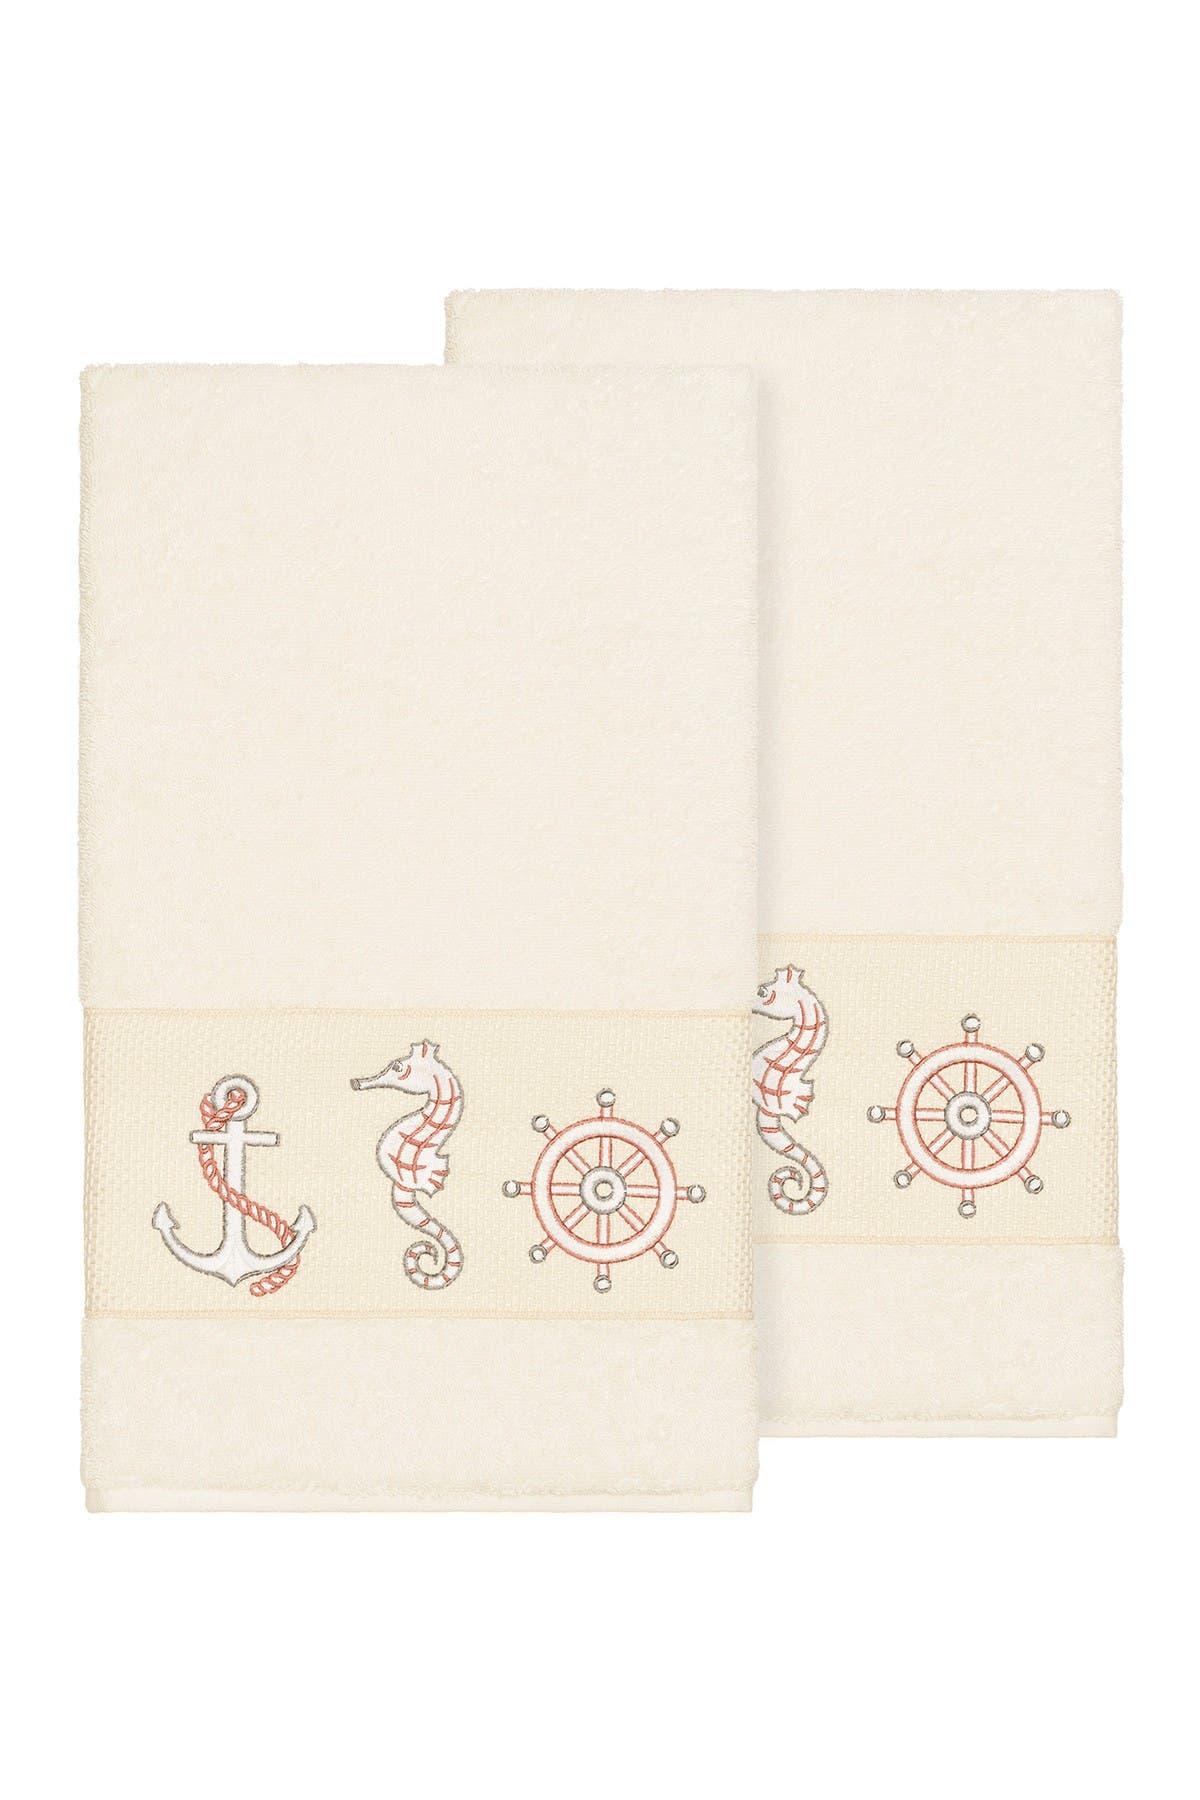 Image of LINUM HOME Easton Embellished Bath Towel - Set of 2 - Cream